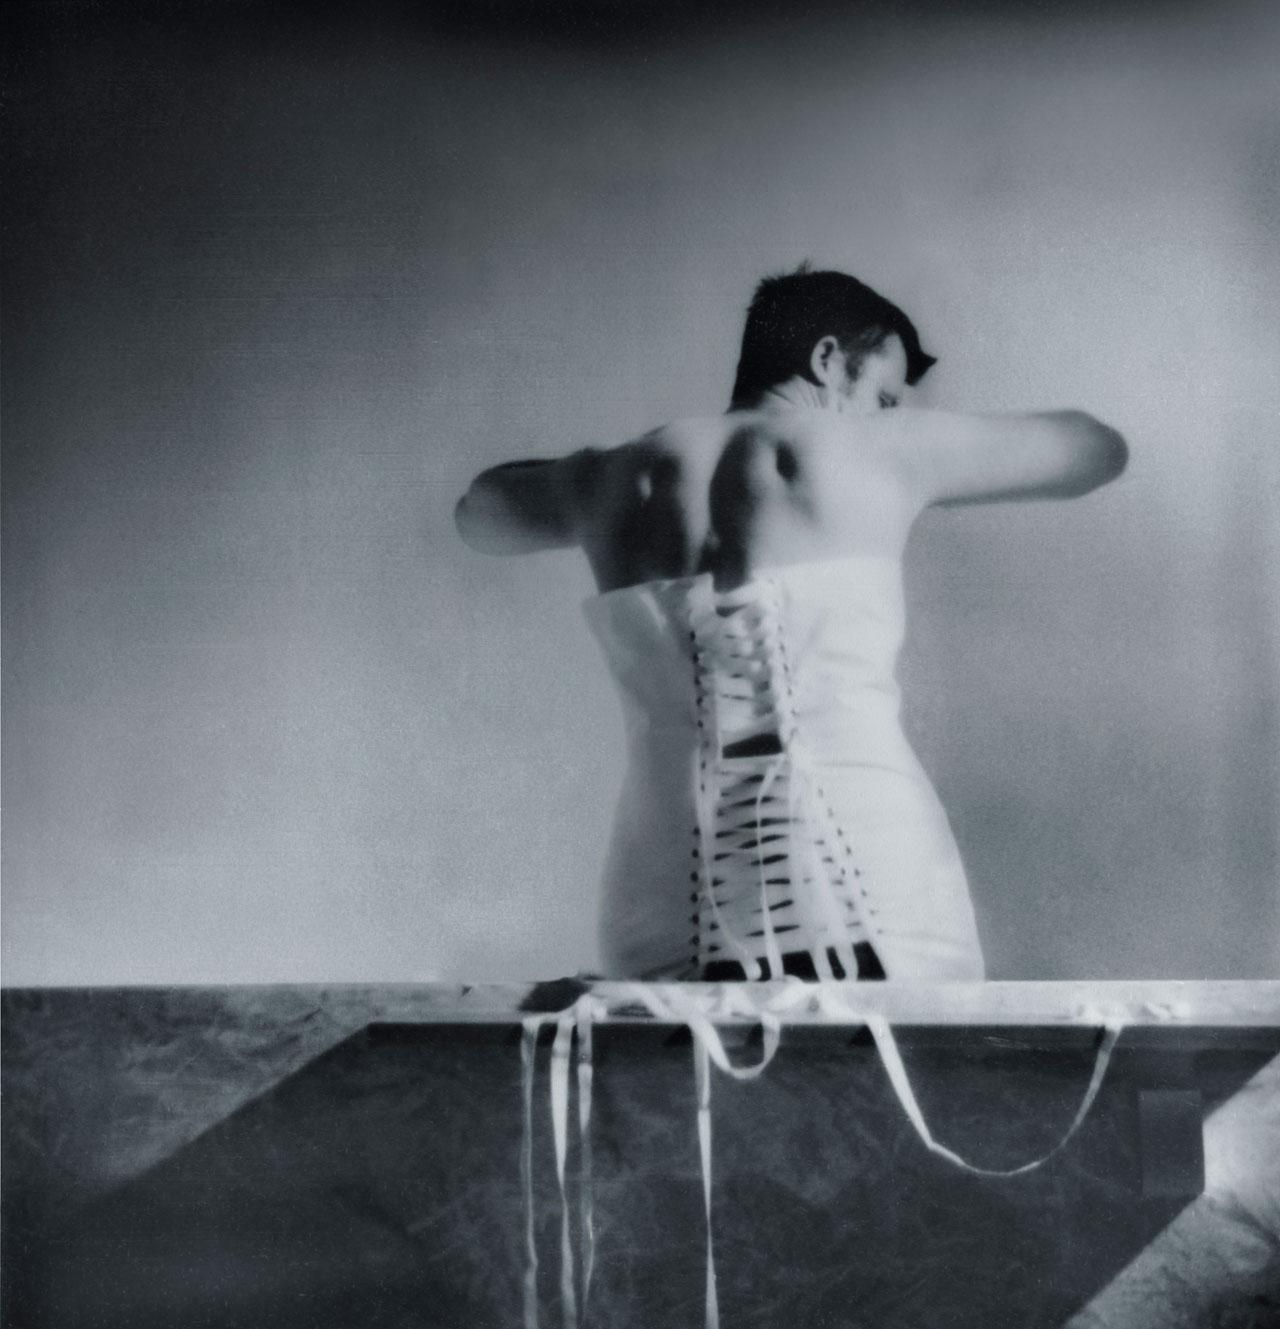 Daniel Wetzel & Gregor Schuster - Supermodels - Felix Schoeller Photoaward